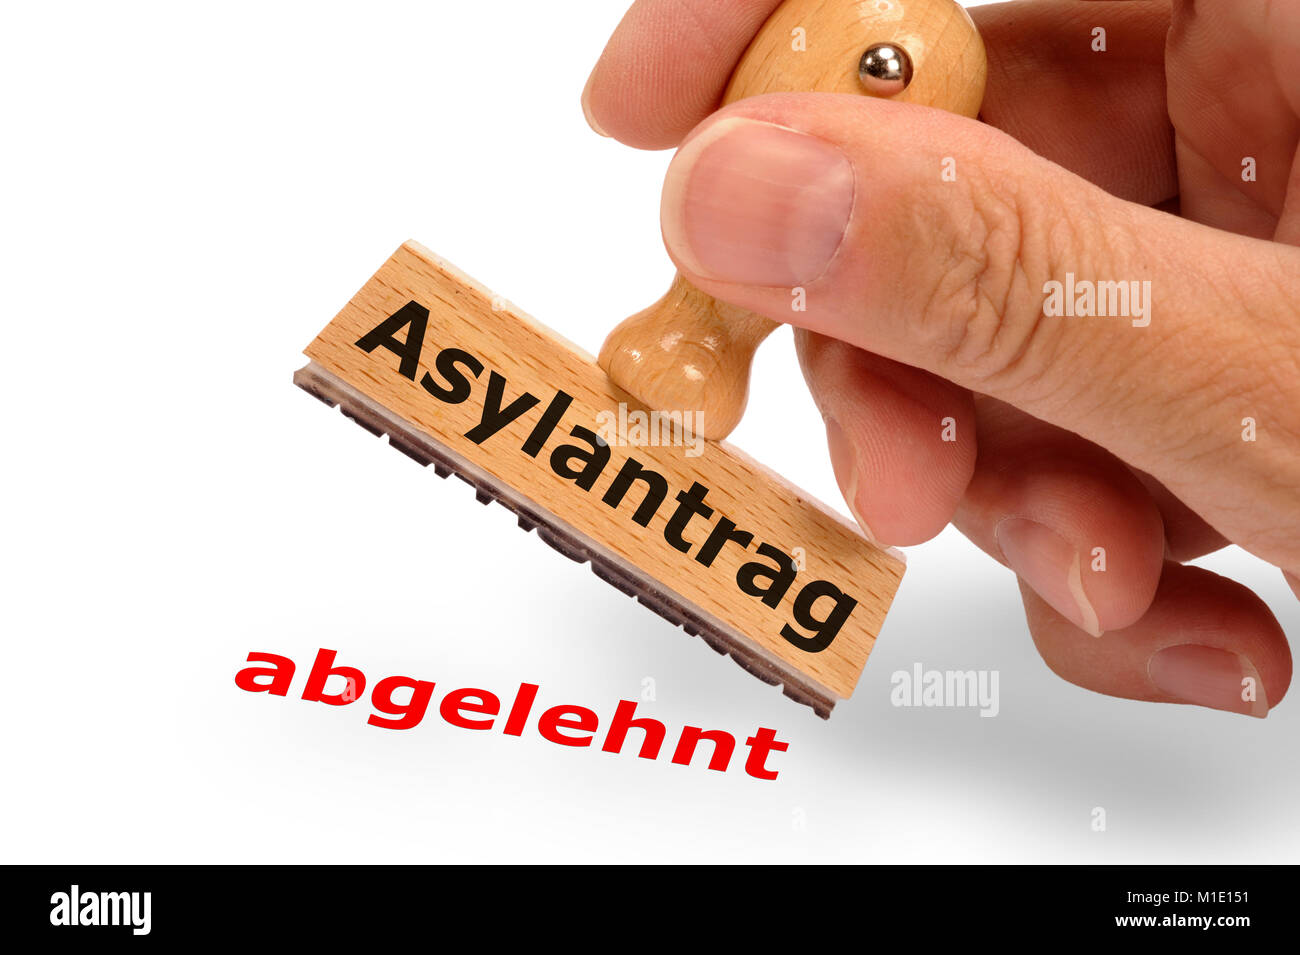 Asylantrag abgelehnt - markiert auf Holzstempel - Stock Image